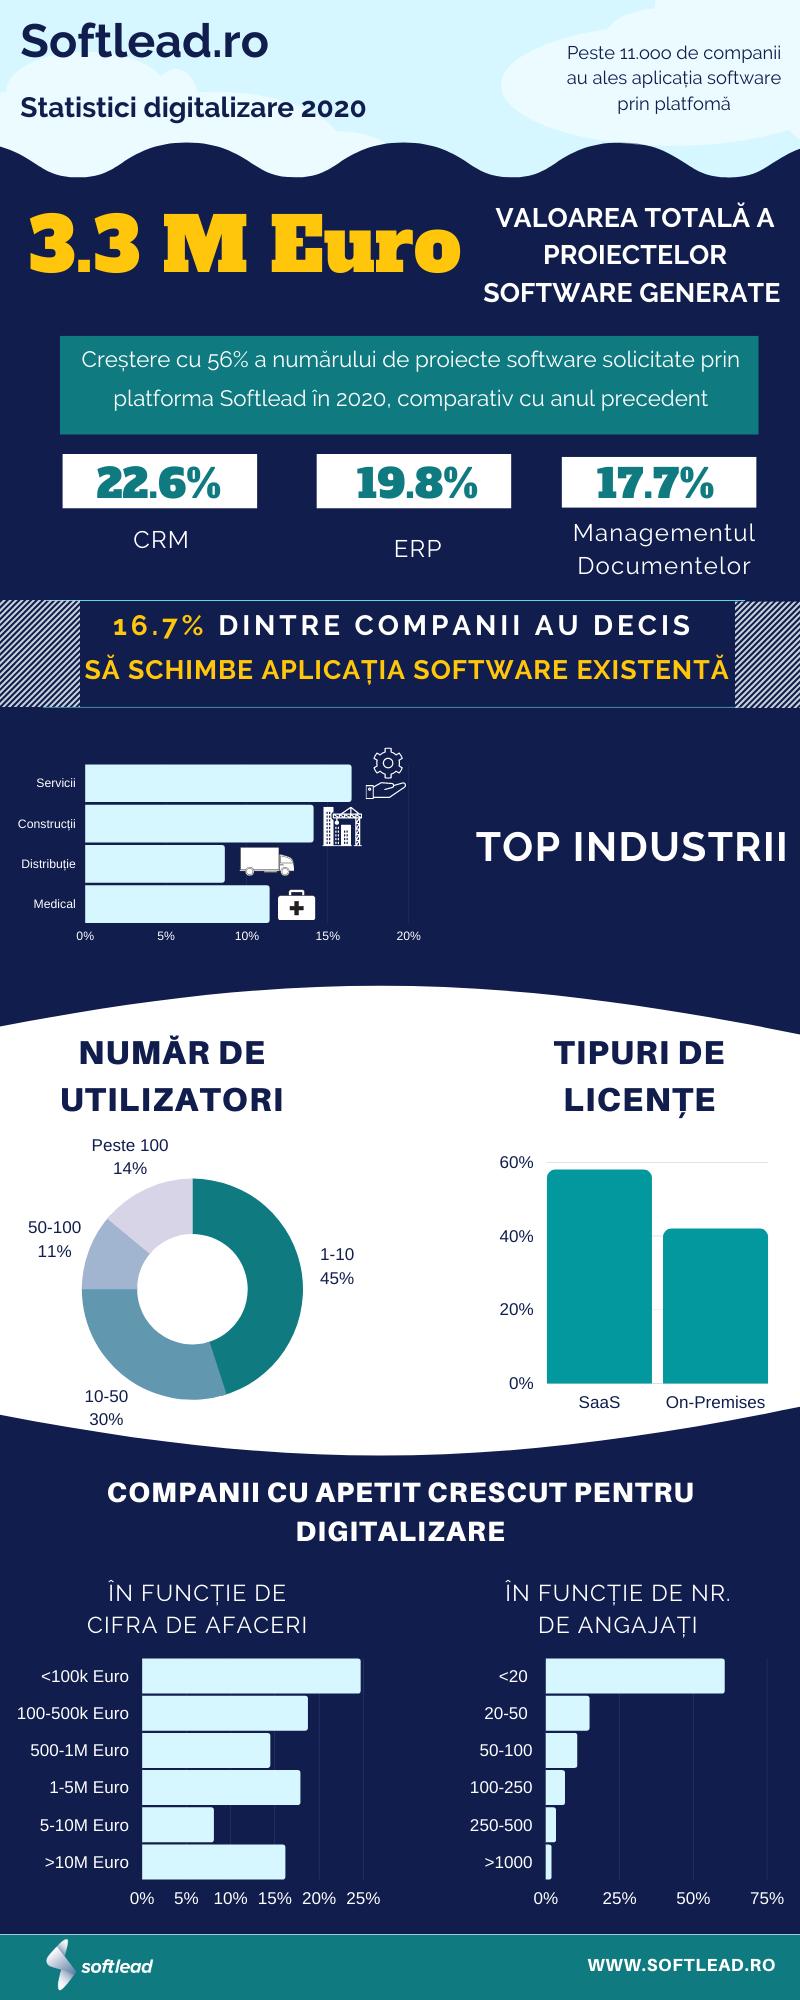 Softlead Statistici oficiale 2020